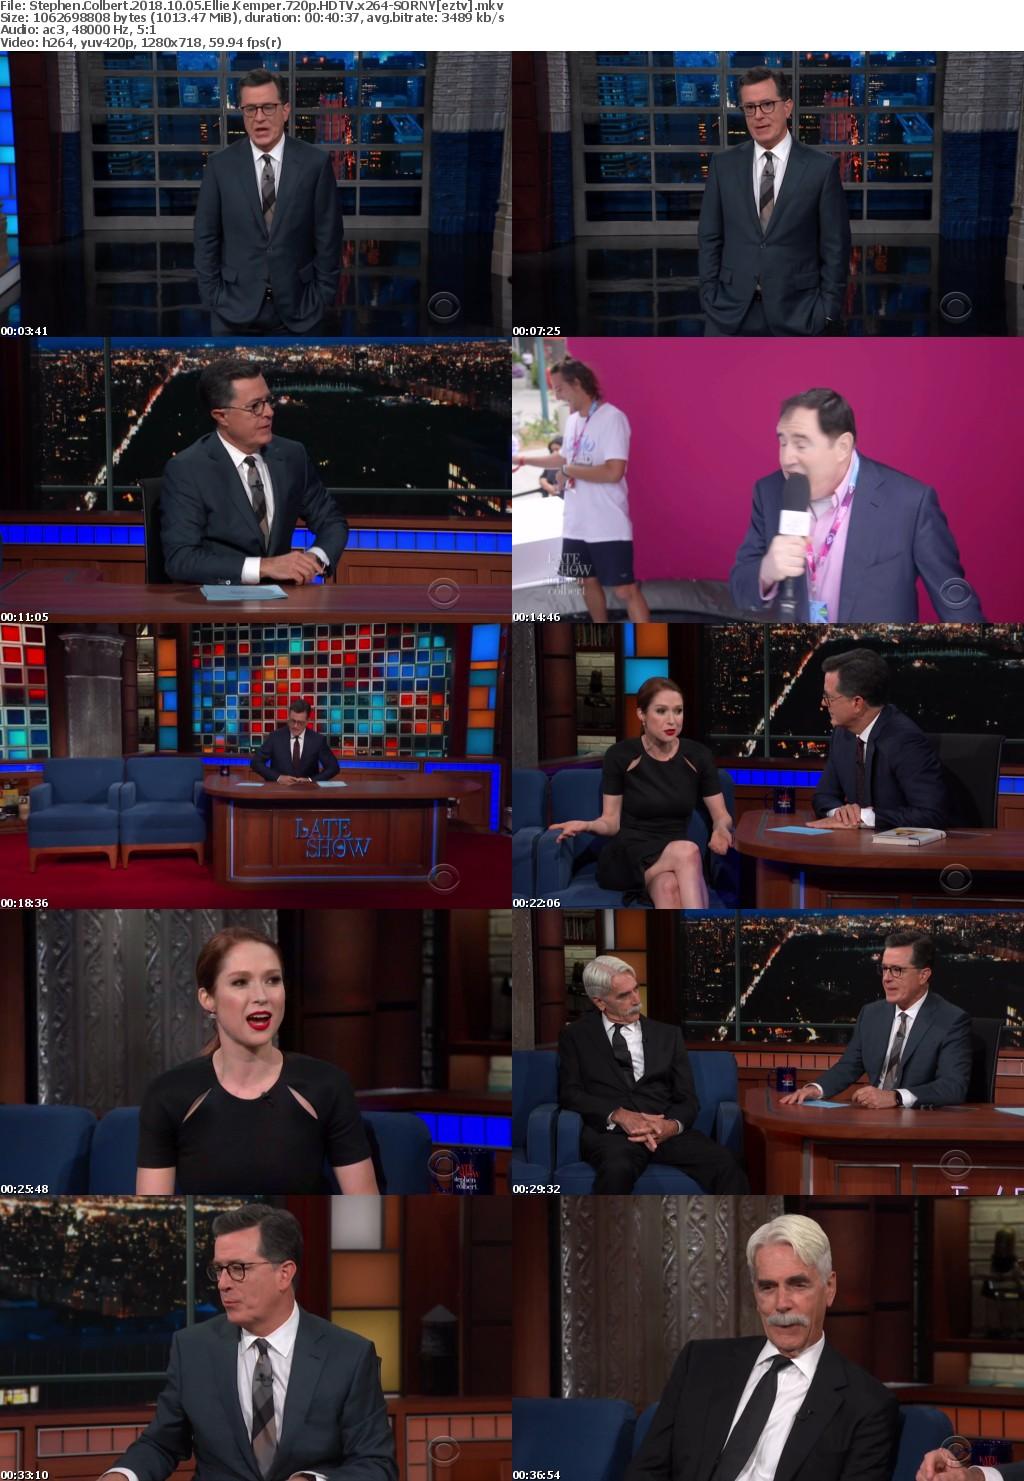 Stephen Colbert (2018) 10 05 Ellie Kemper 720p HDTV x264-SORNY